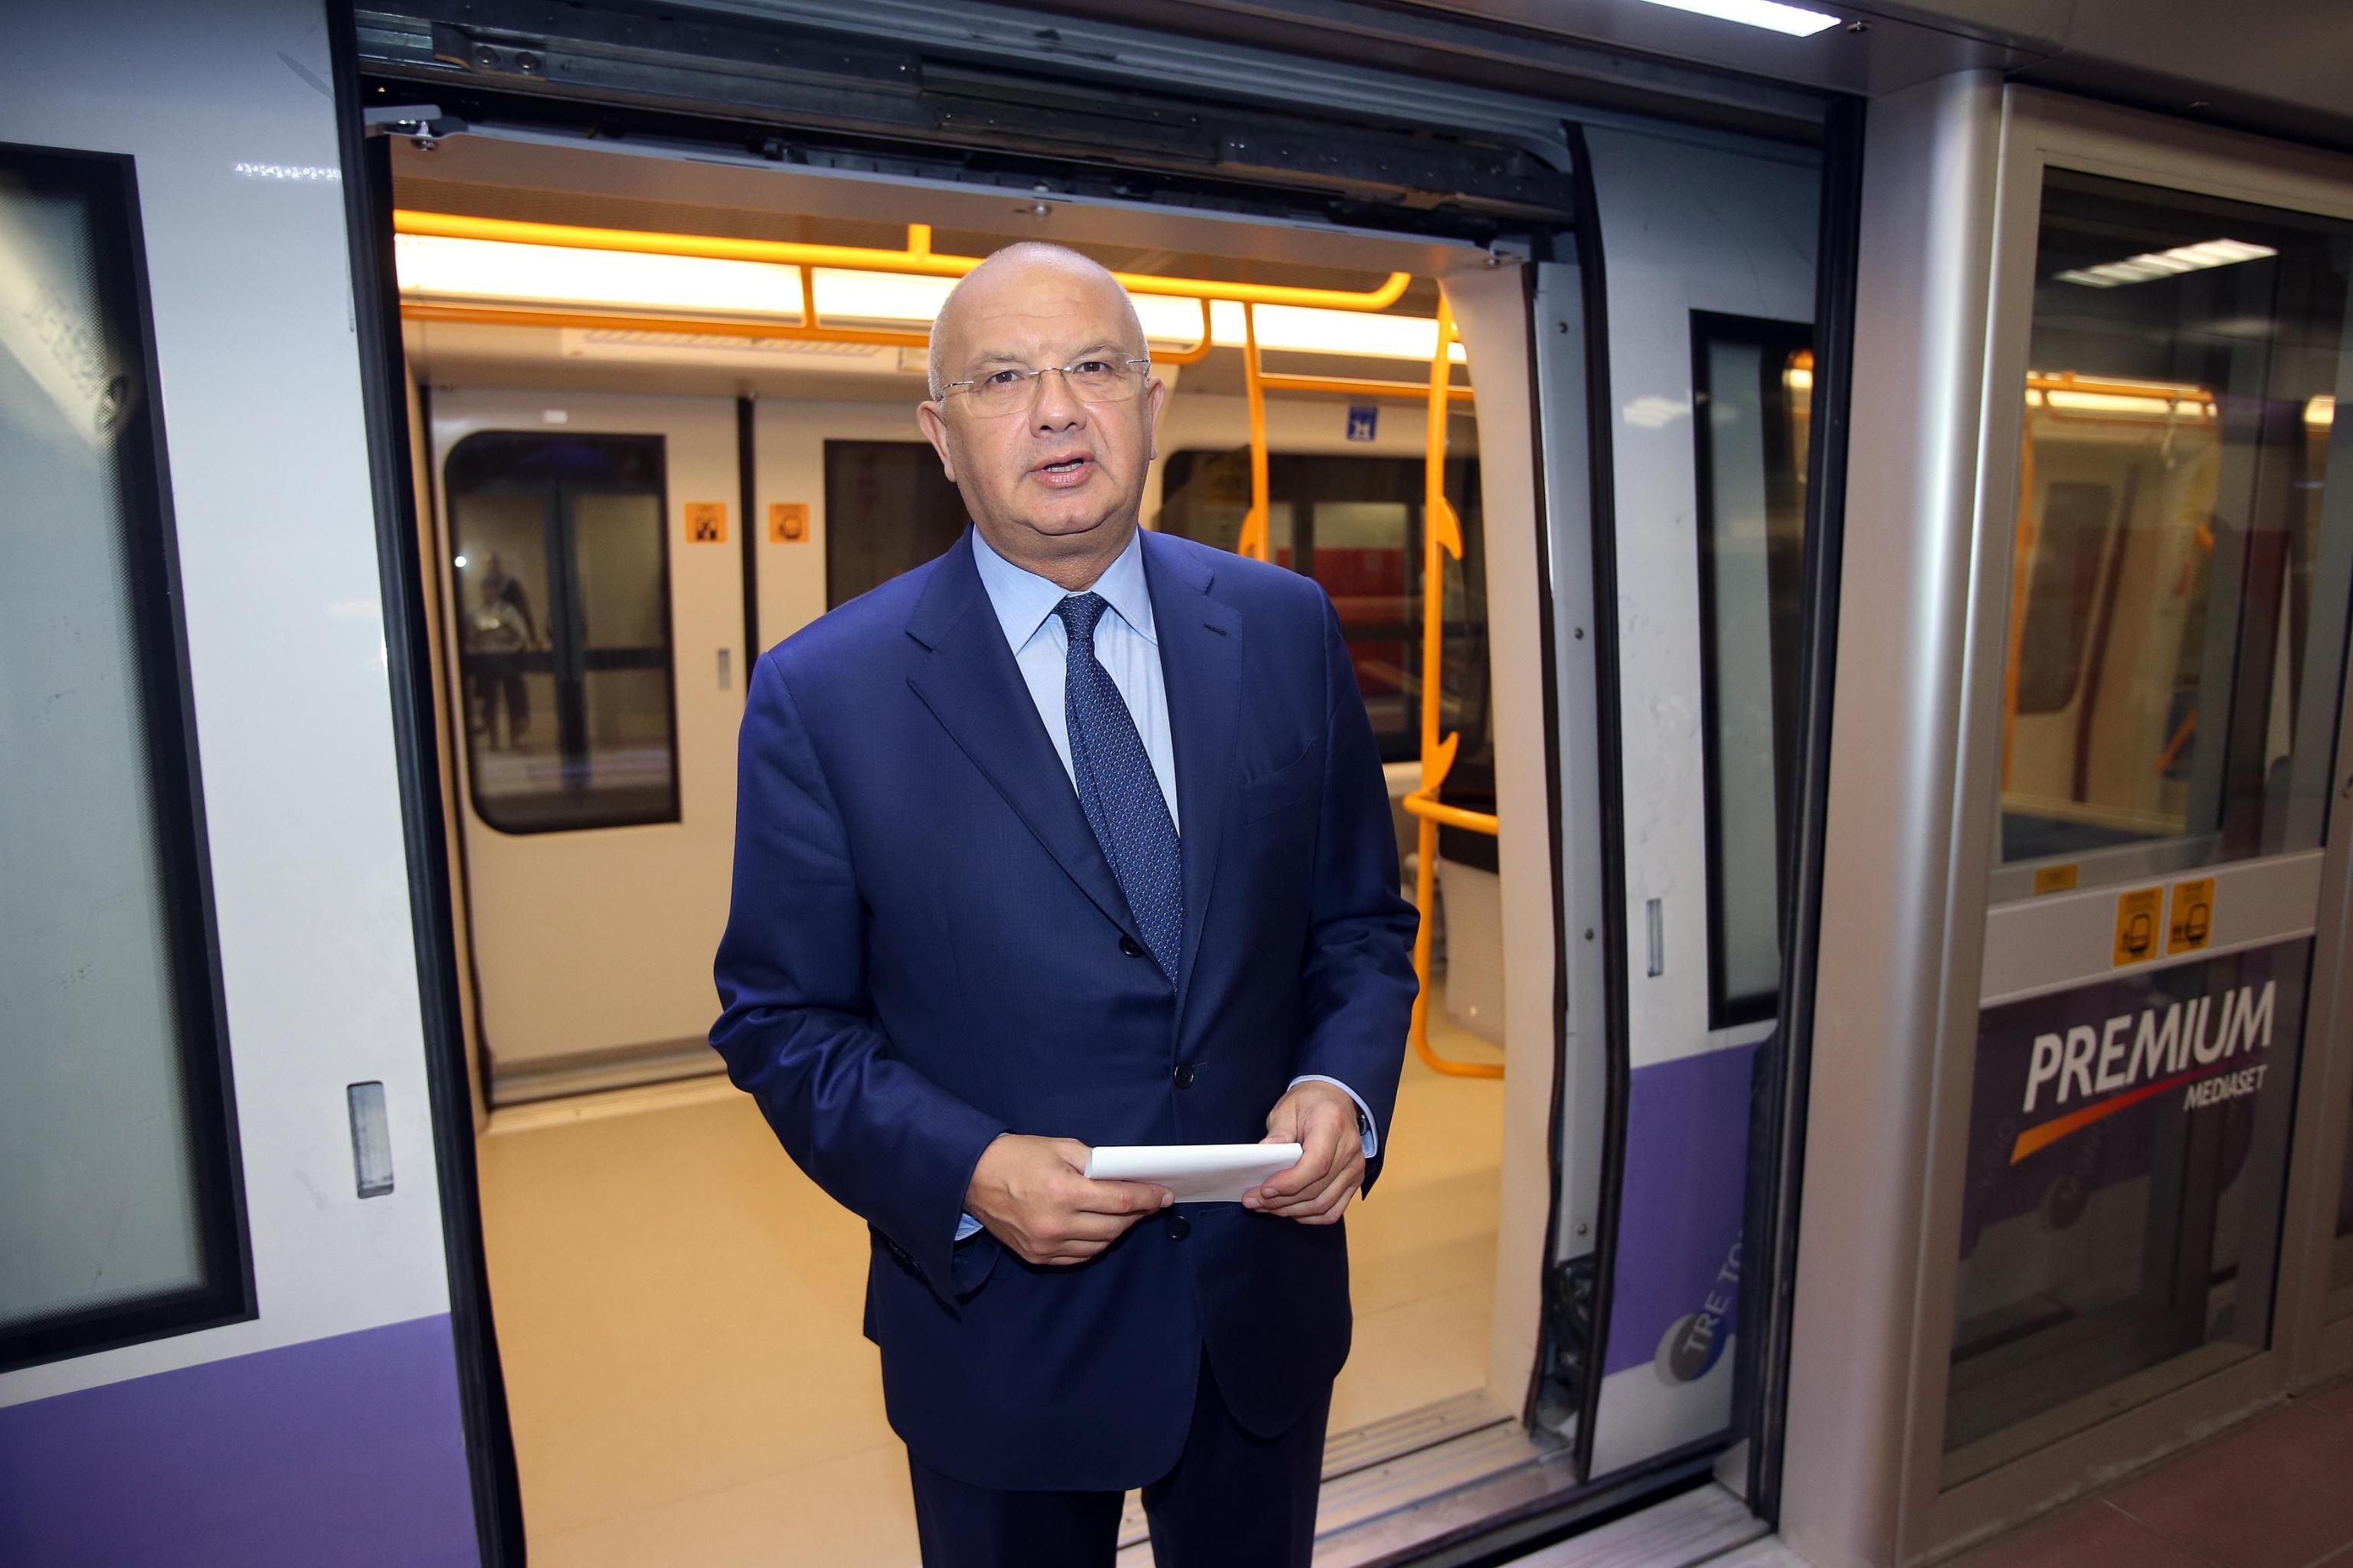 "Presentazione ufficiale stazione metropolitana M5 ""San Siro Stadio Mediaset Premium"""